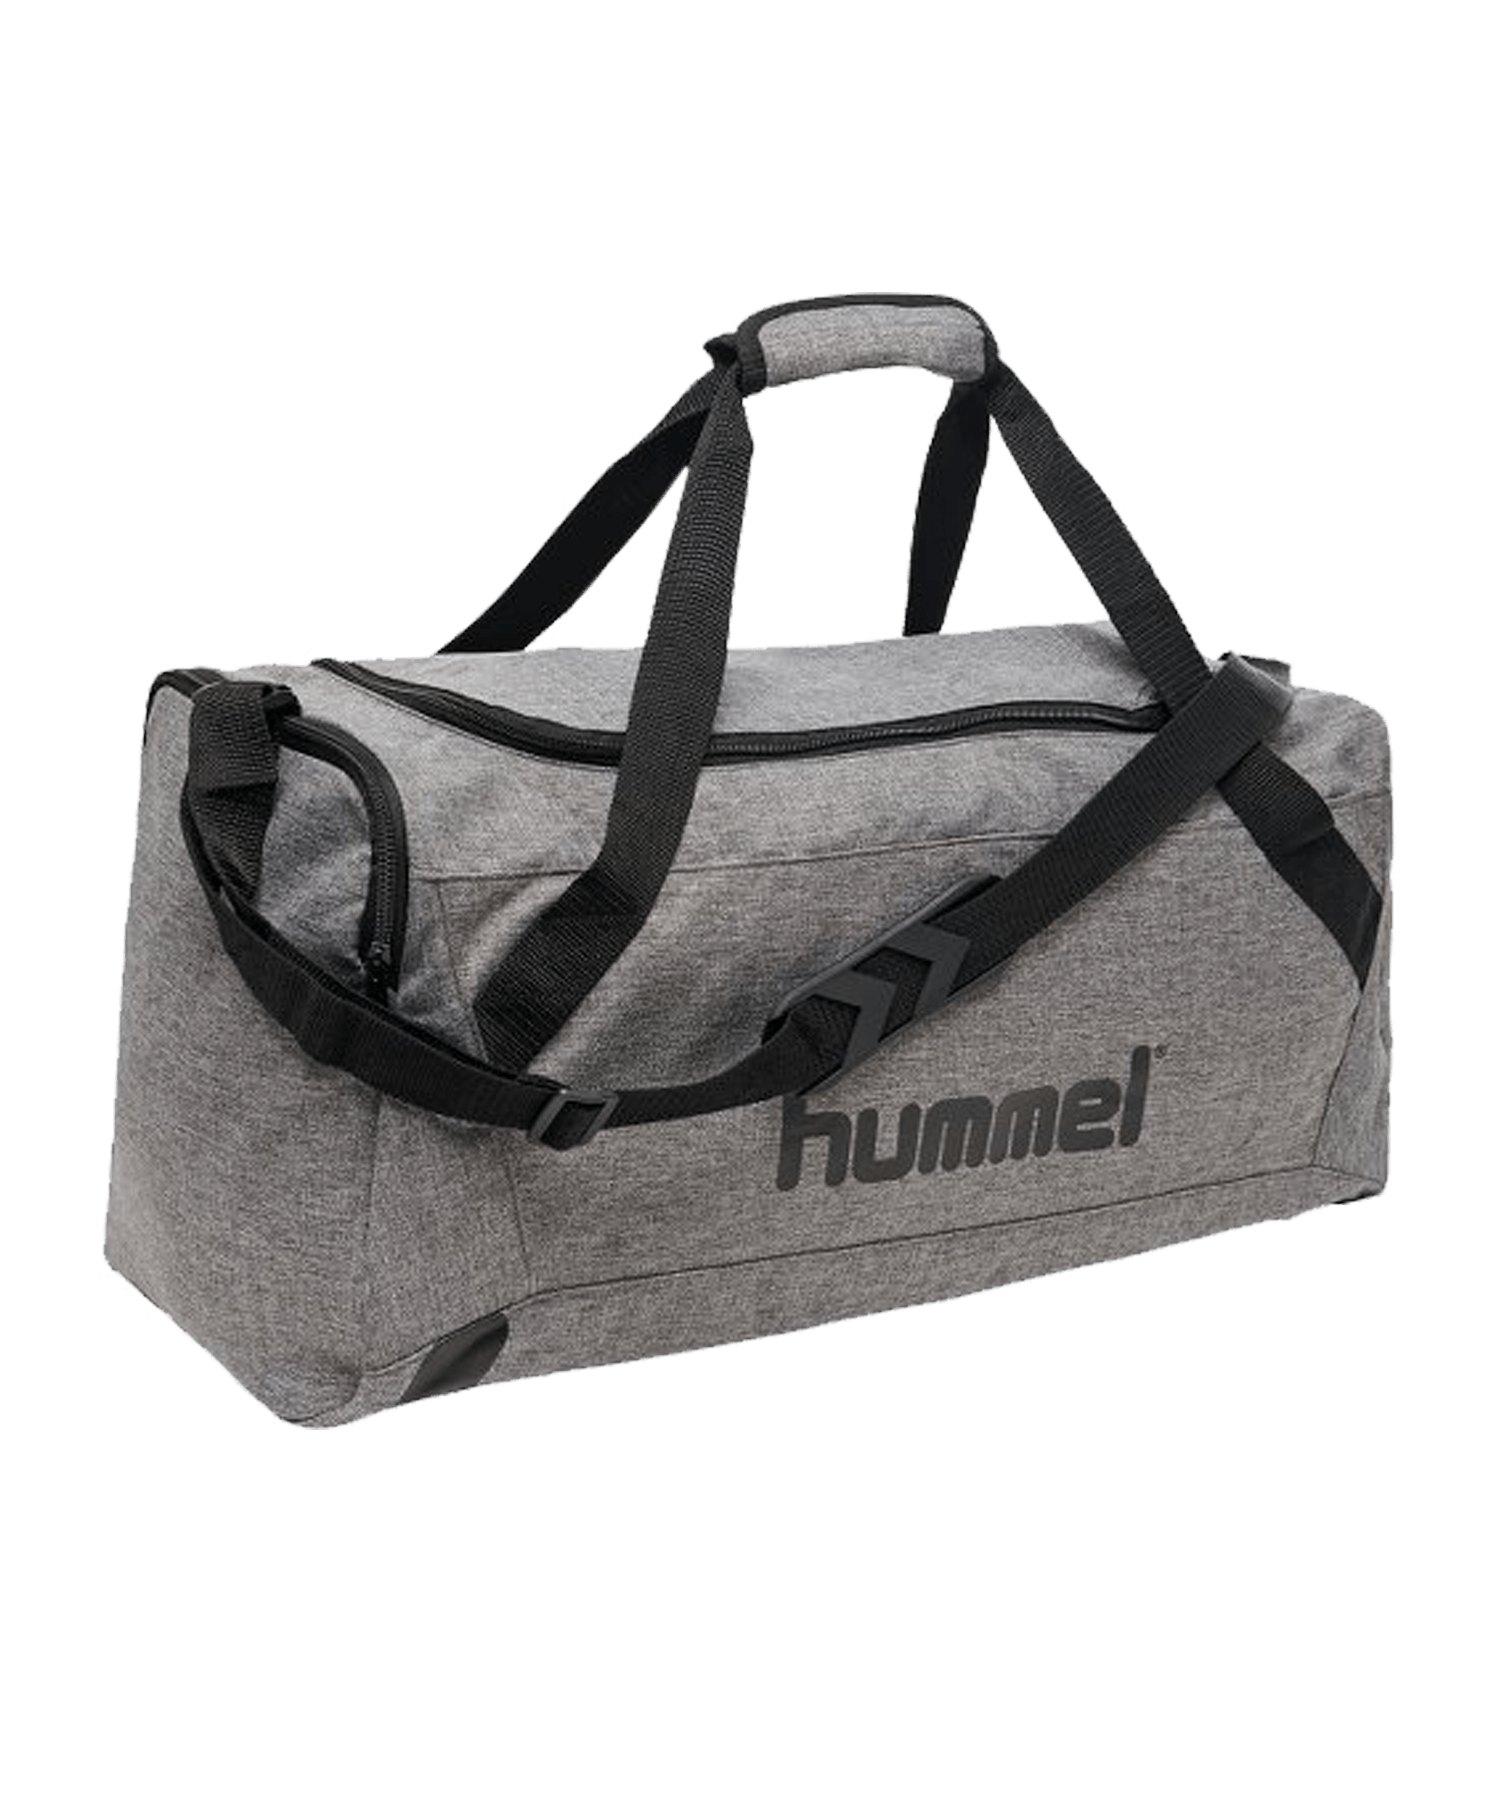 Hummel Core Bag Sporttasche Grau F2006 Gr.L - grau